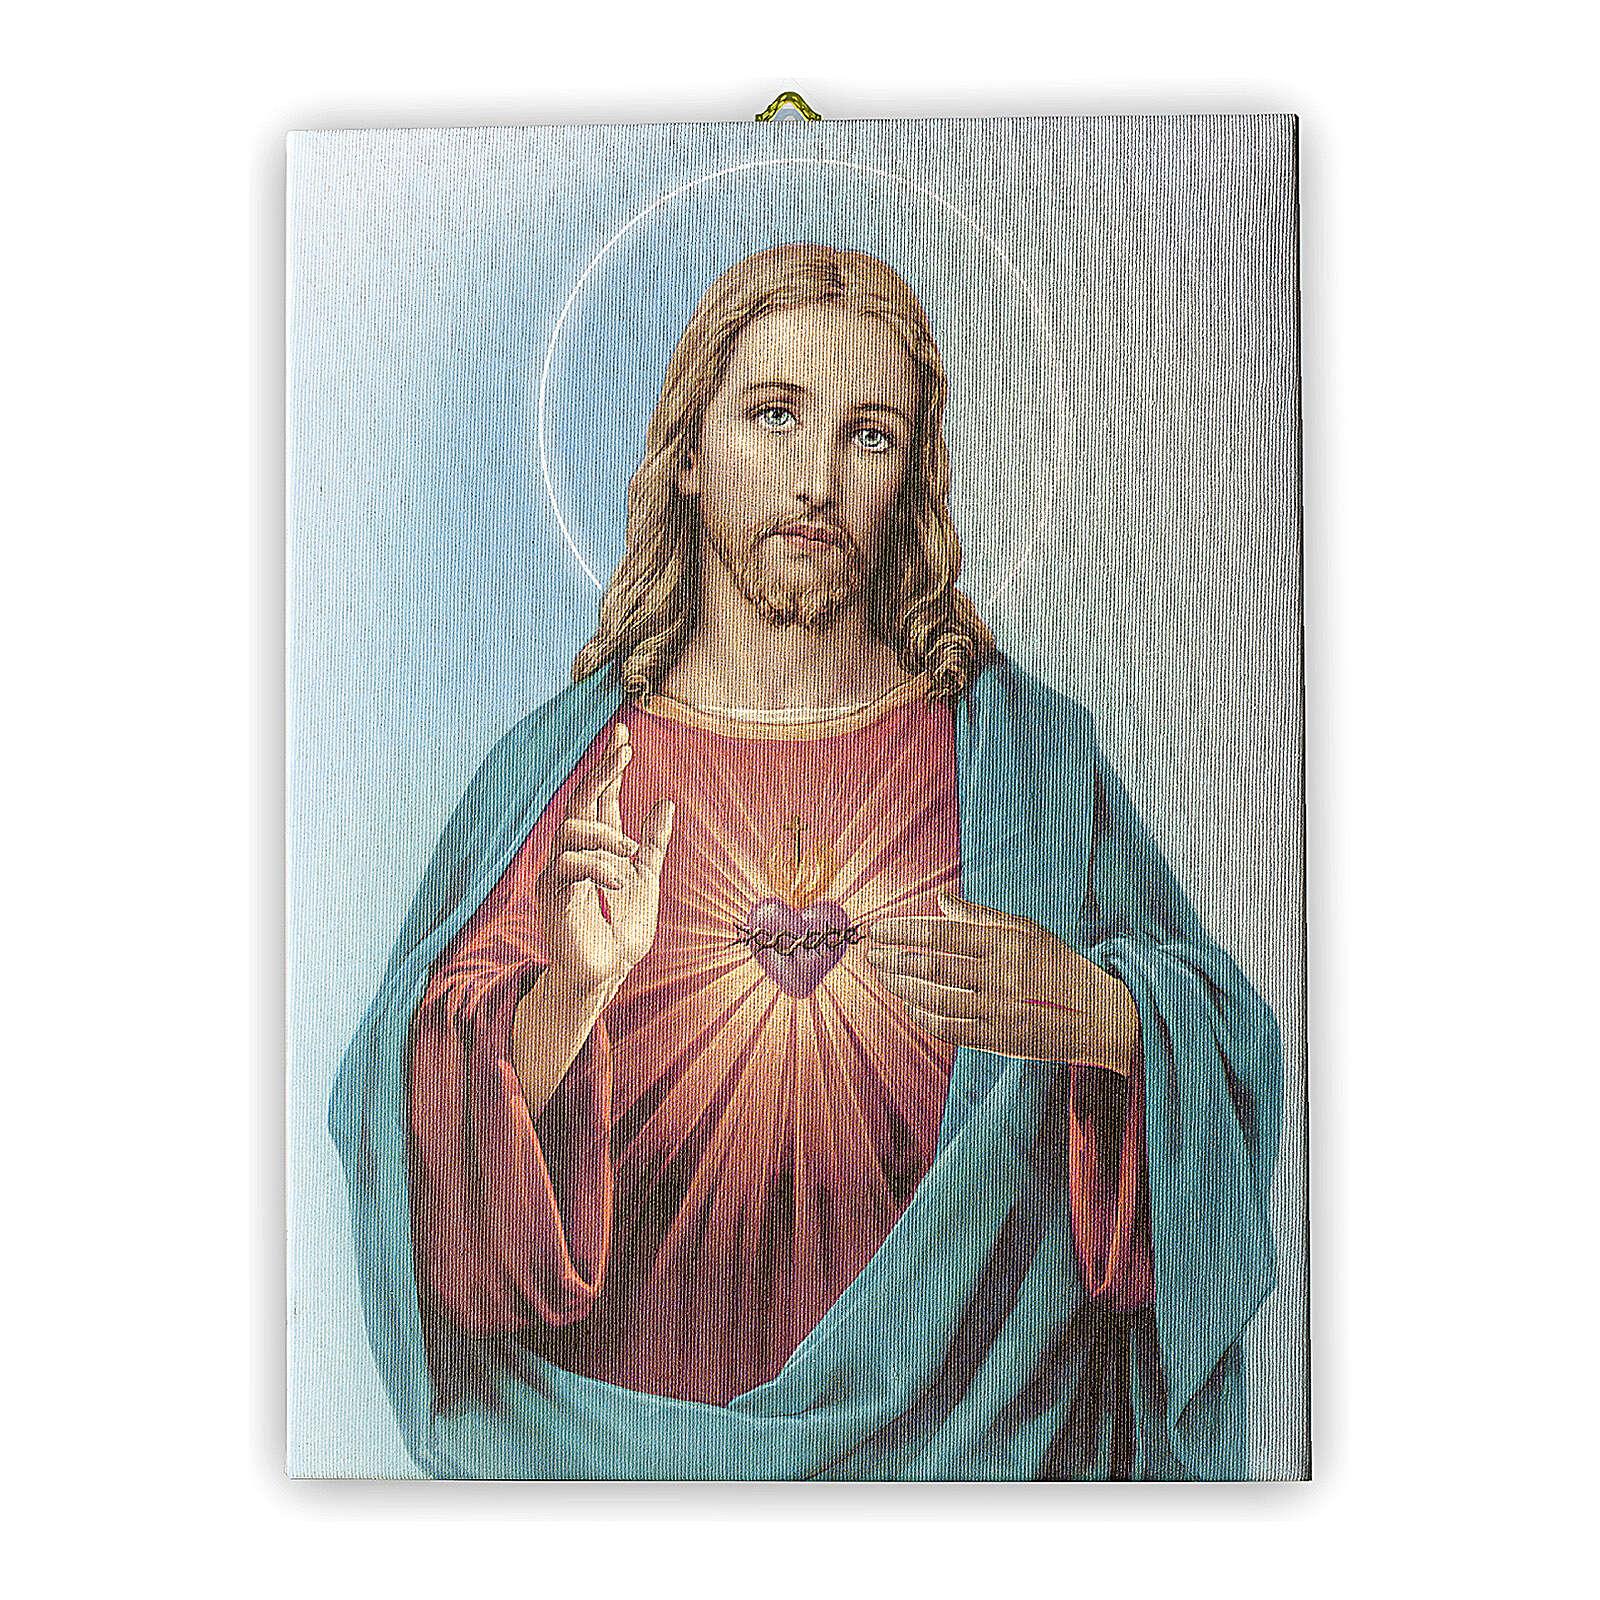 Bild auf Leinwand Heiligstes Herz Jesu, 25x20 cm 3